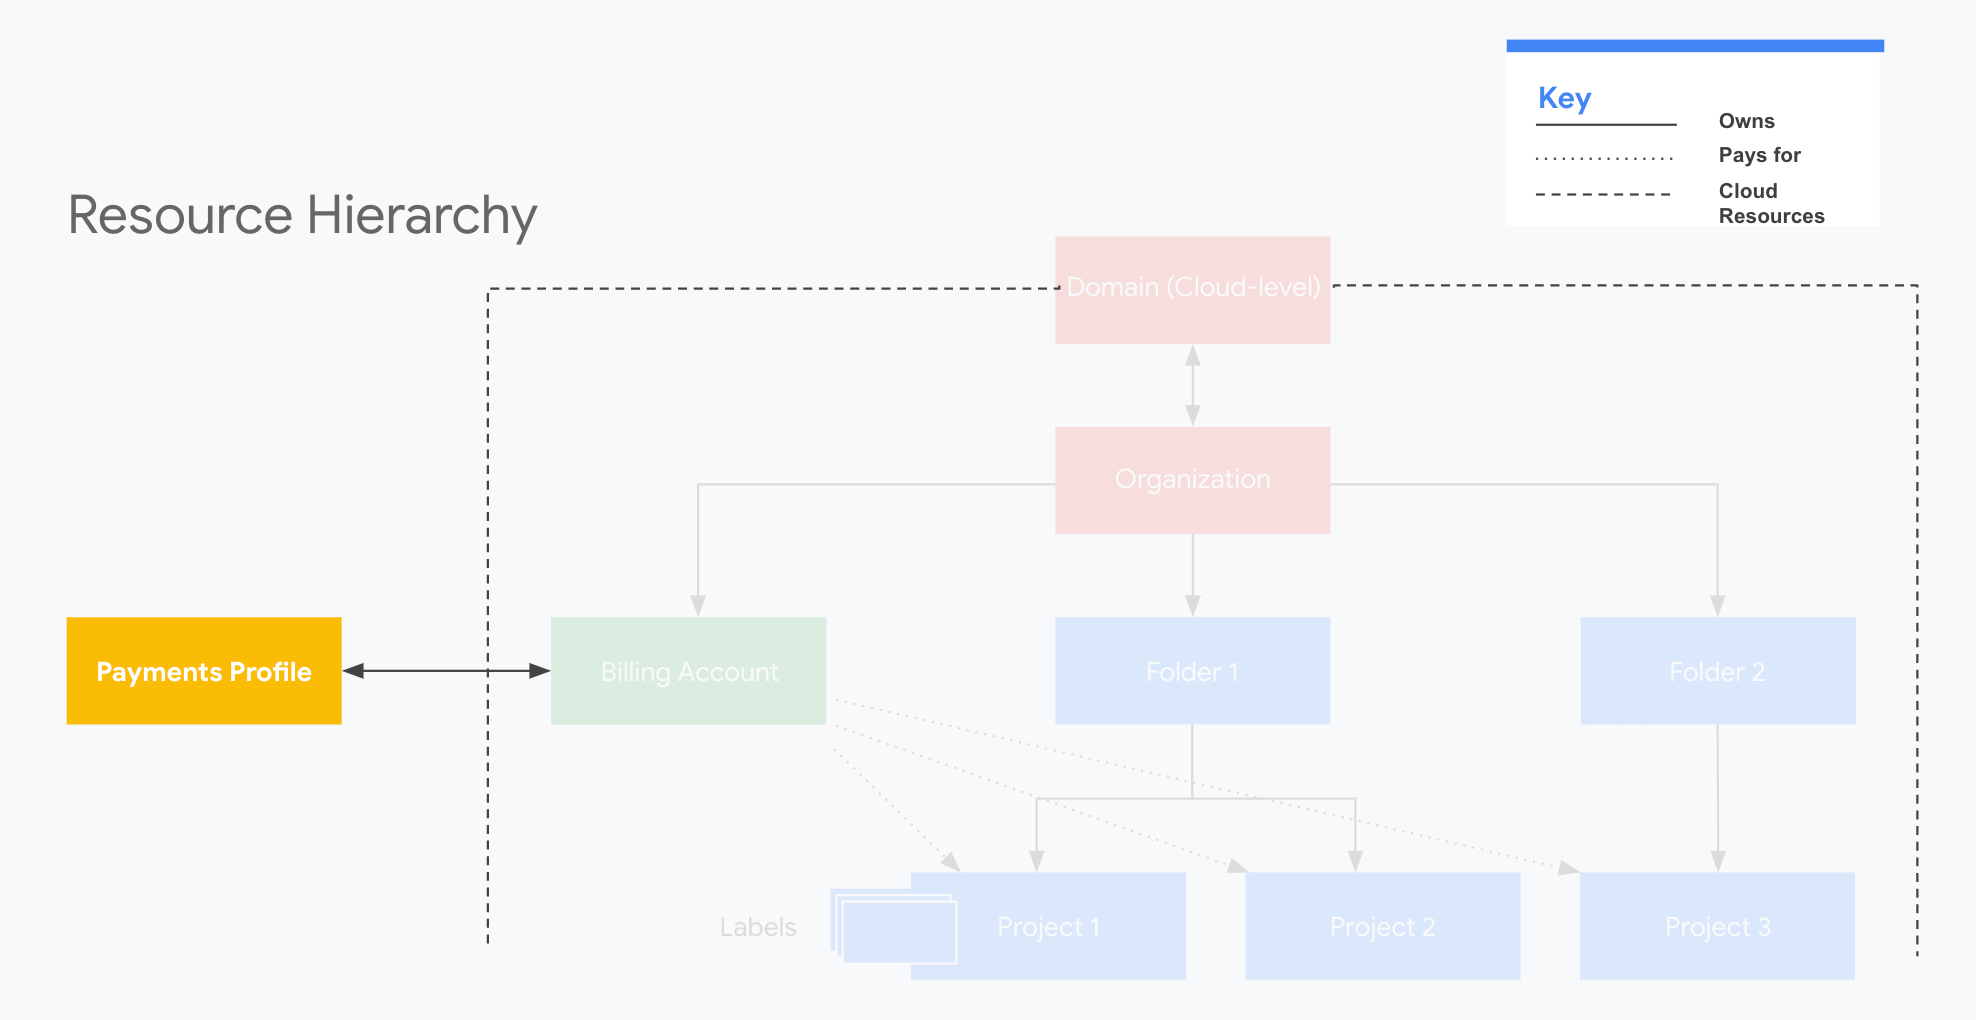 Perfil do Google Payments na hierarquia de recursos